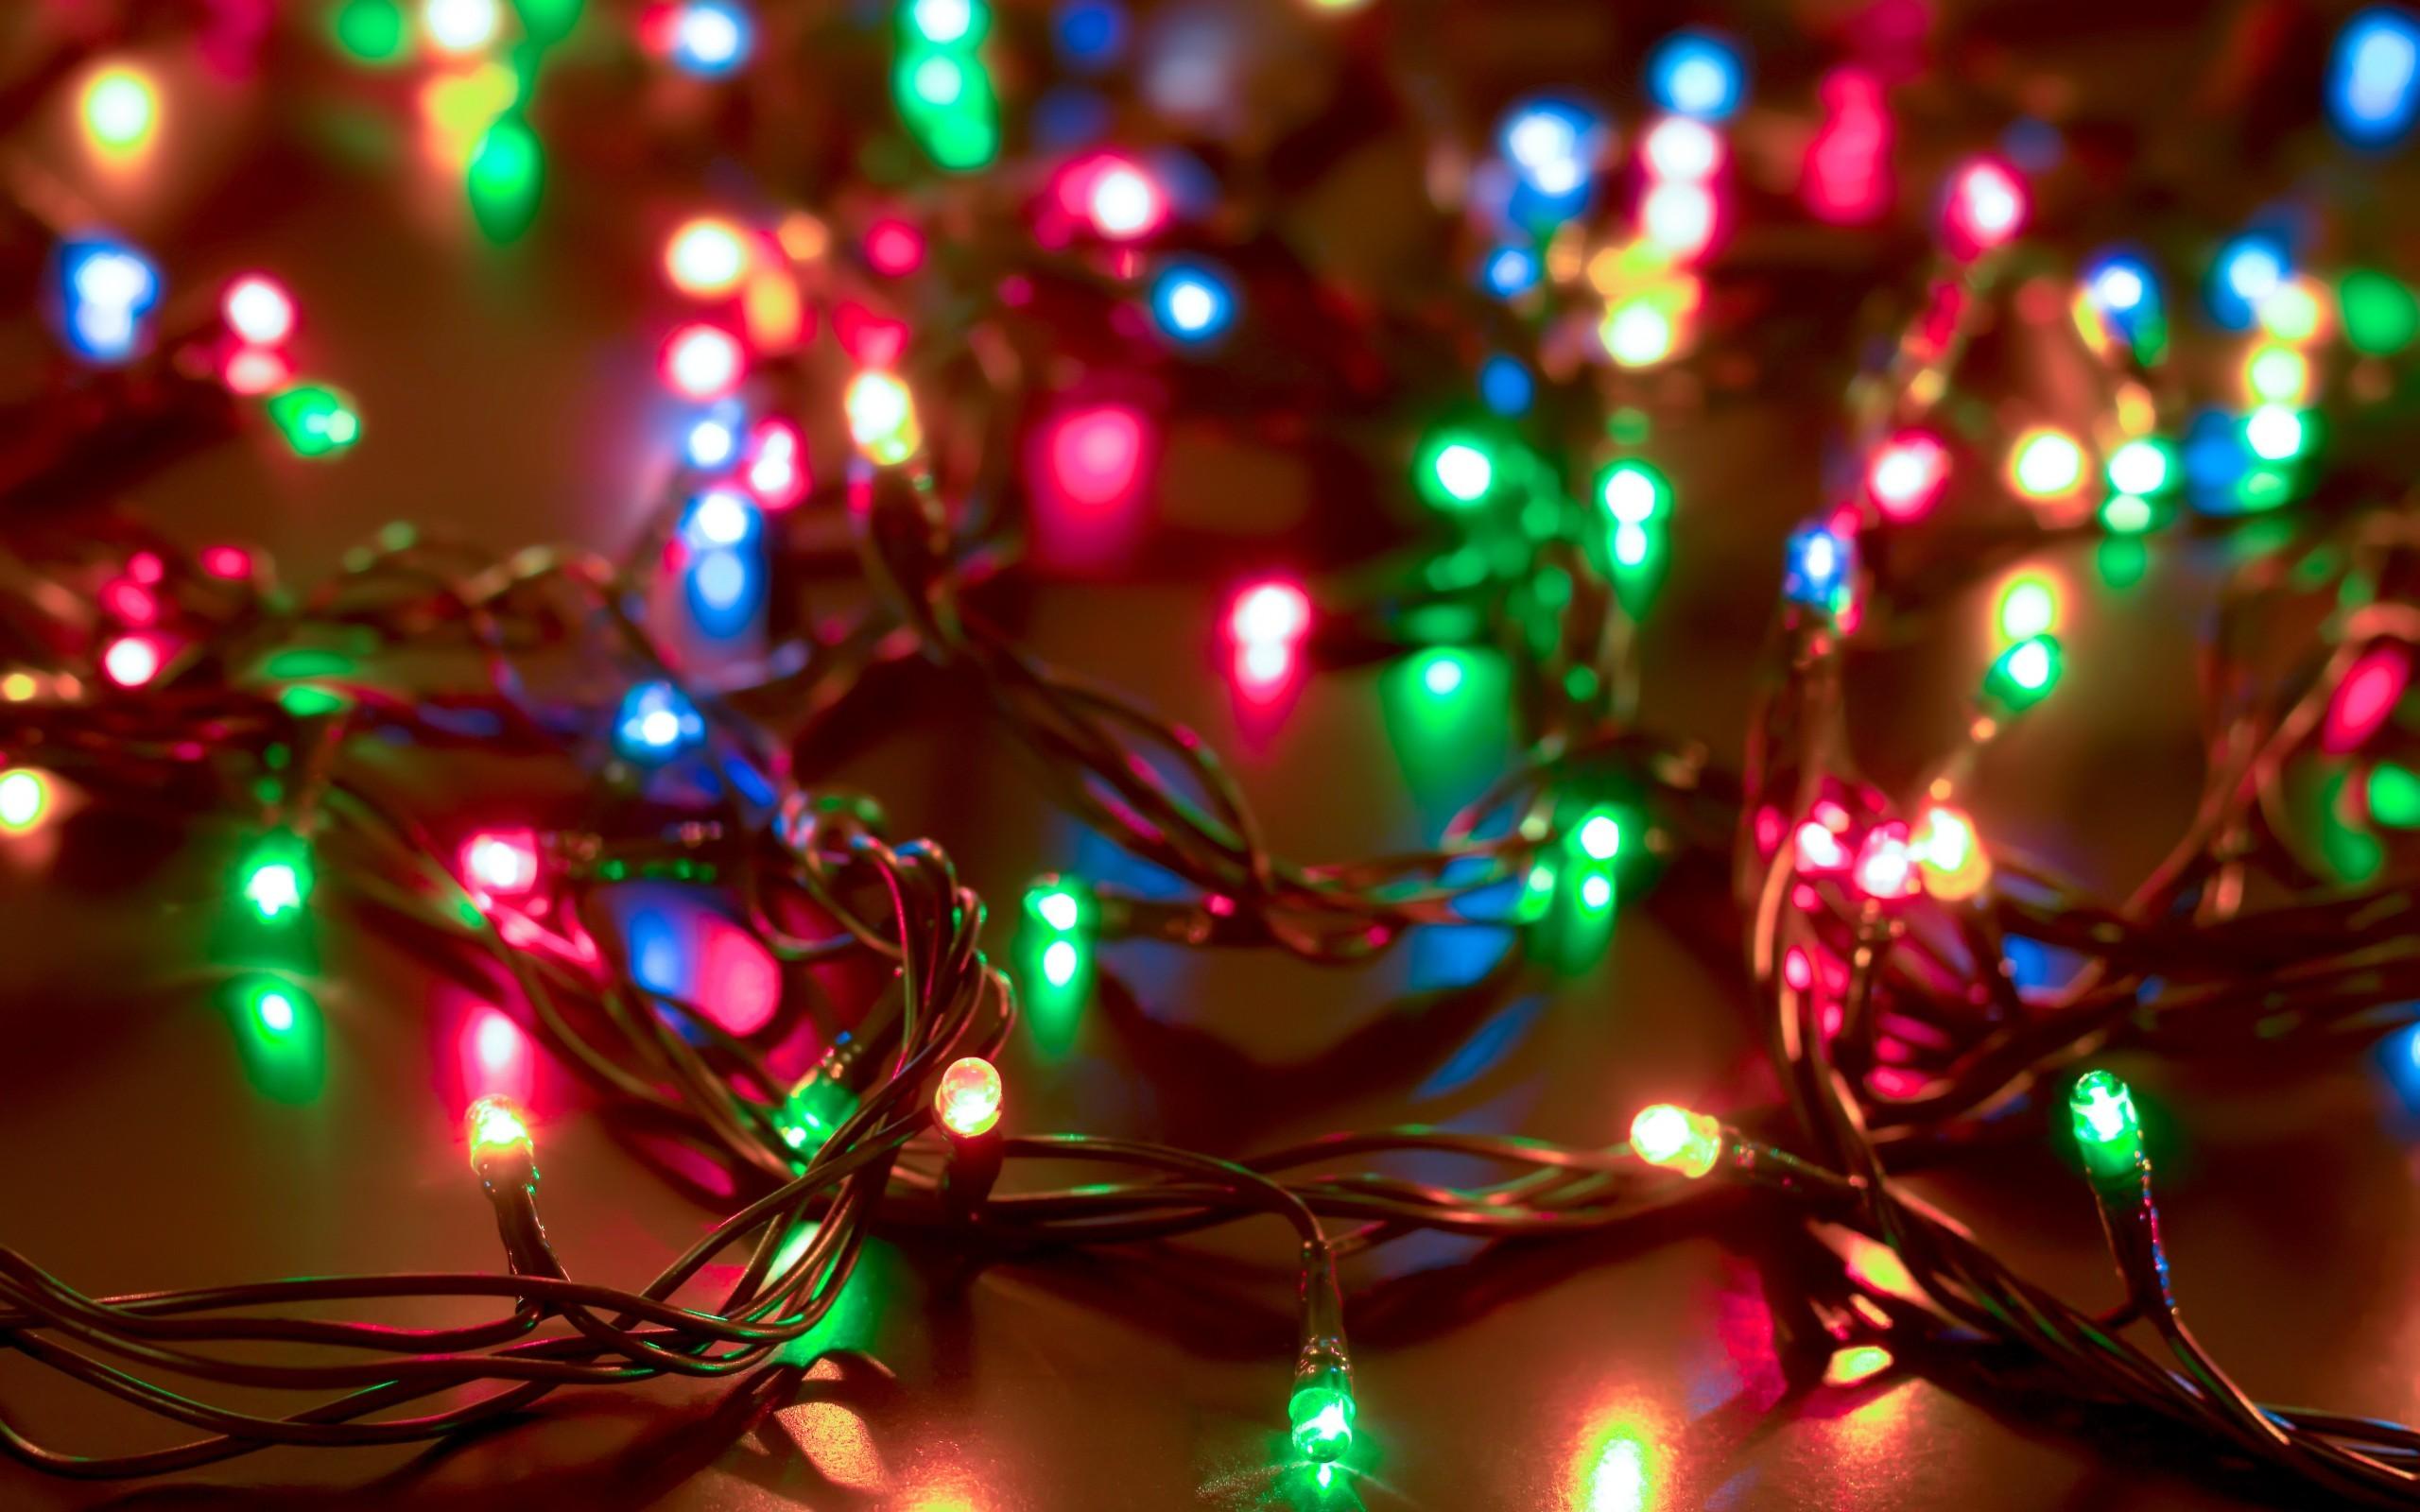 lights depth of field snow branch Christmas Tree circle Christmas New Year christmas lights wires light color christmas decoration 291743